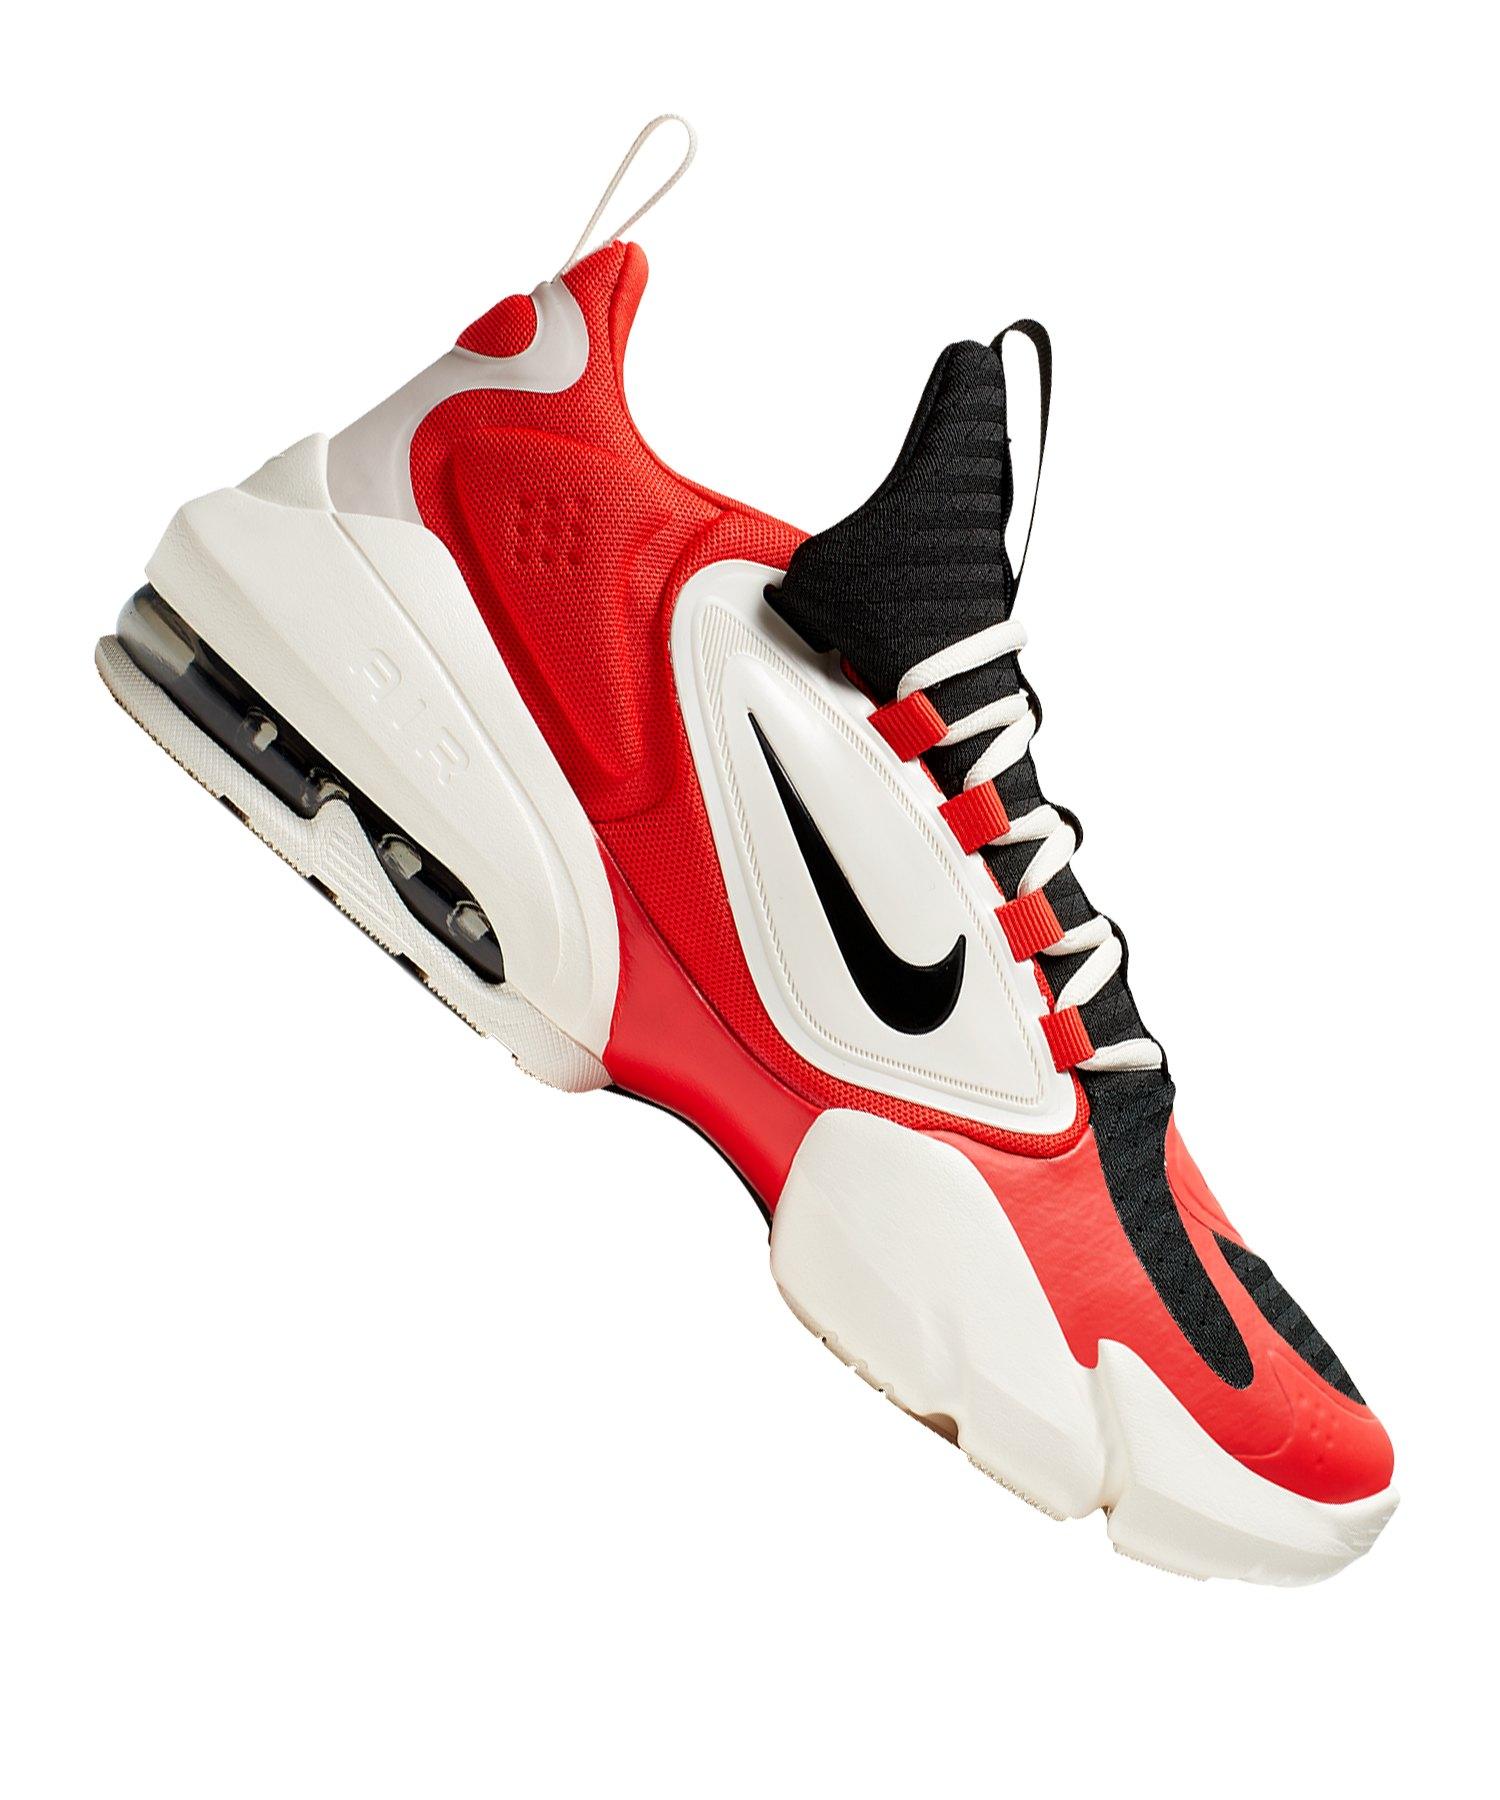 Nike Air Max Tavas Rot Red 43 9,5 wie Neu